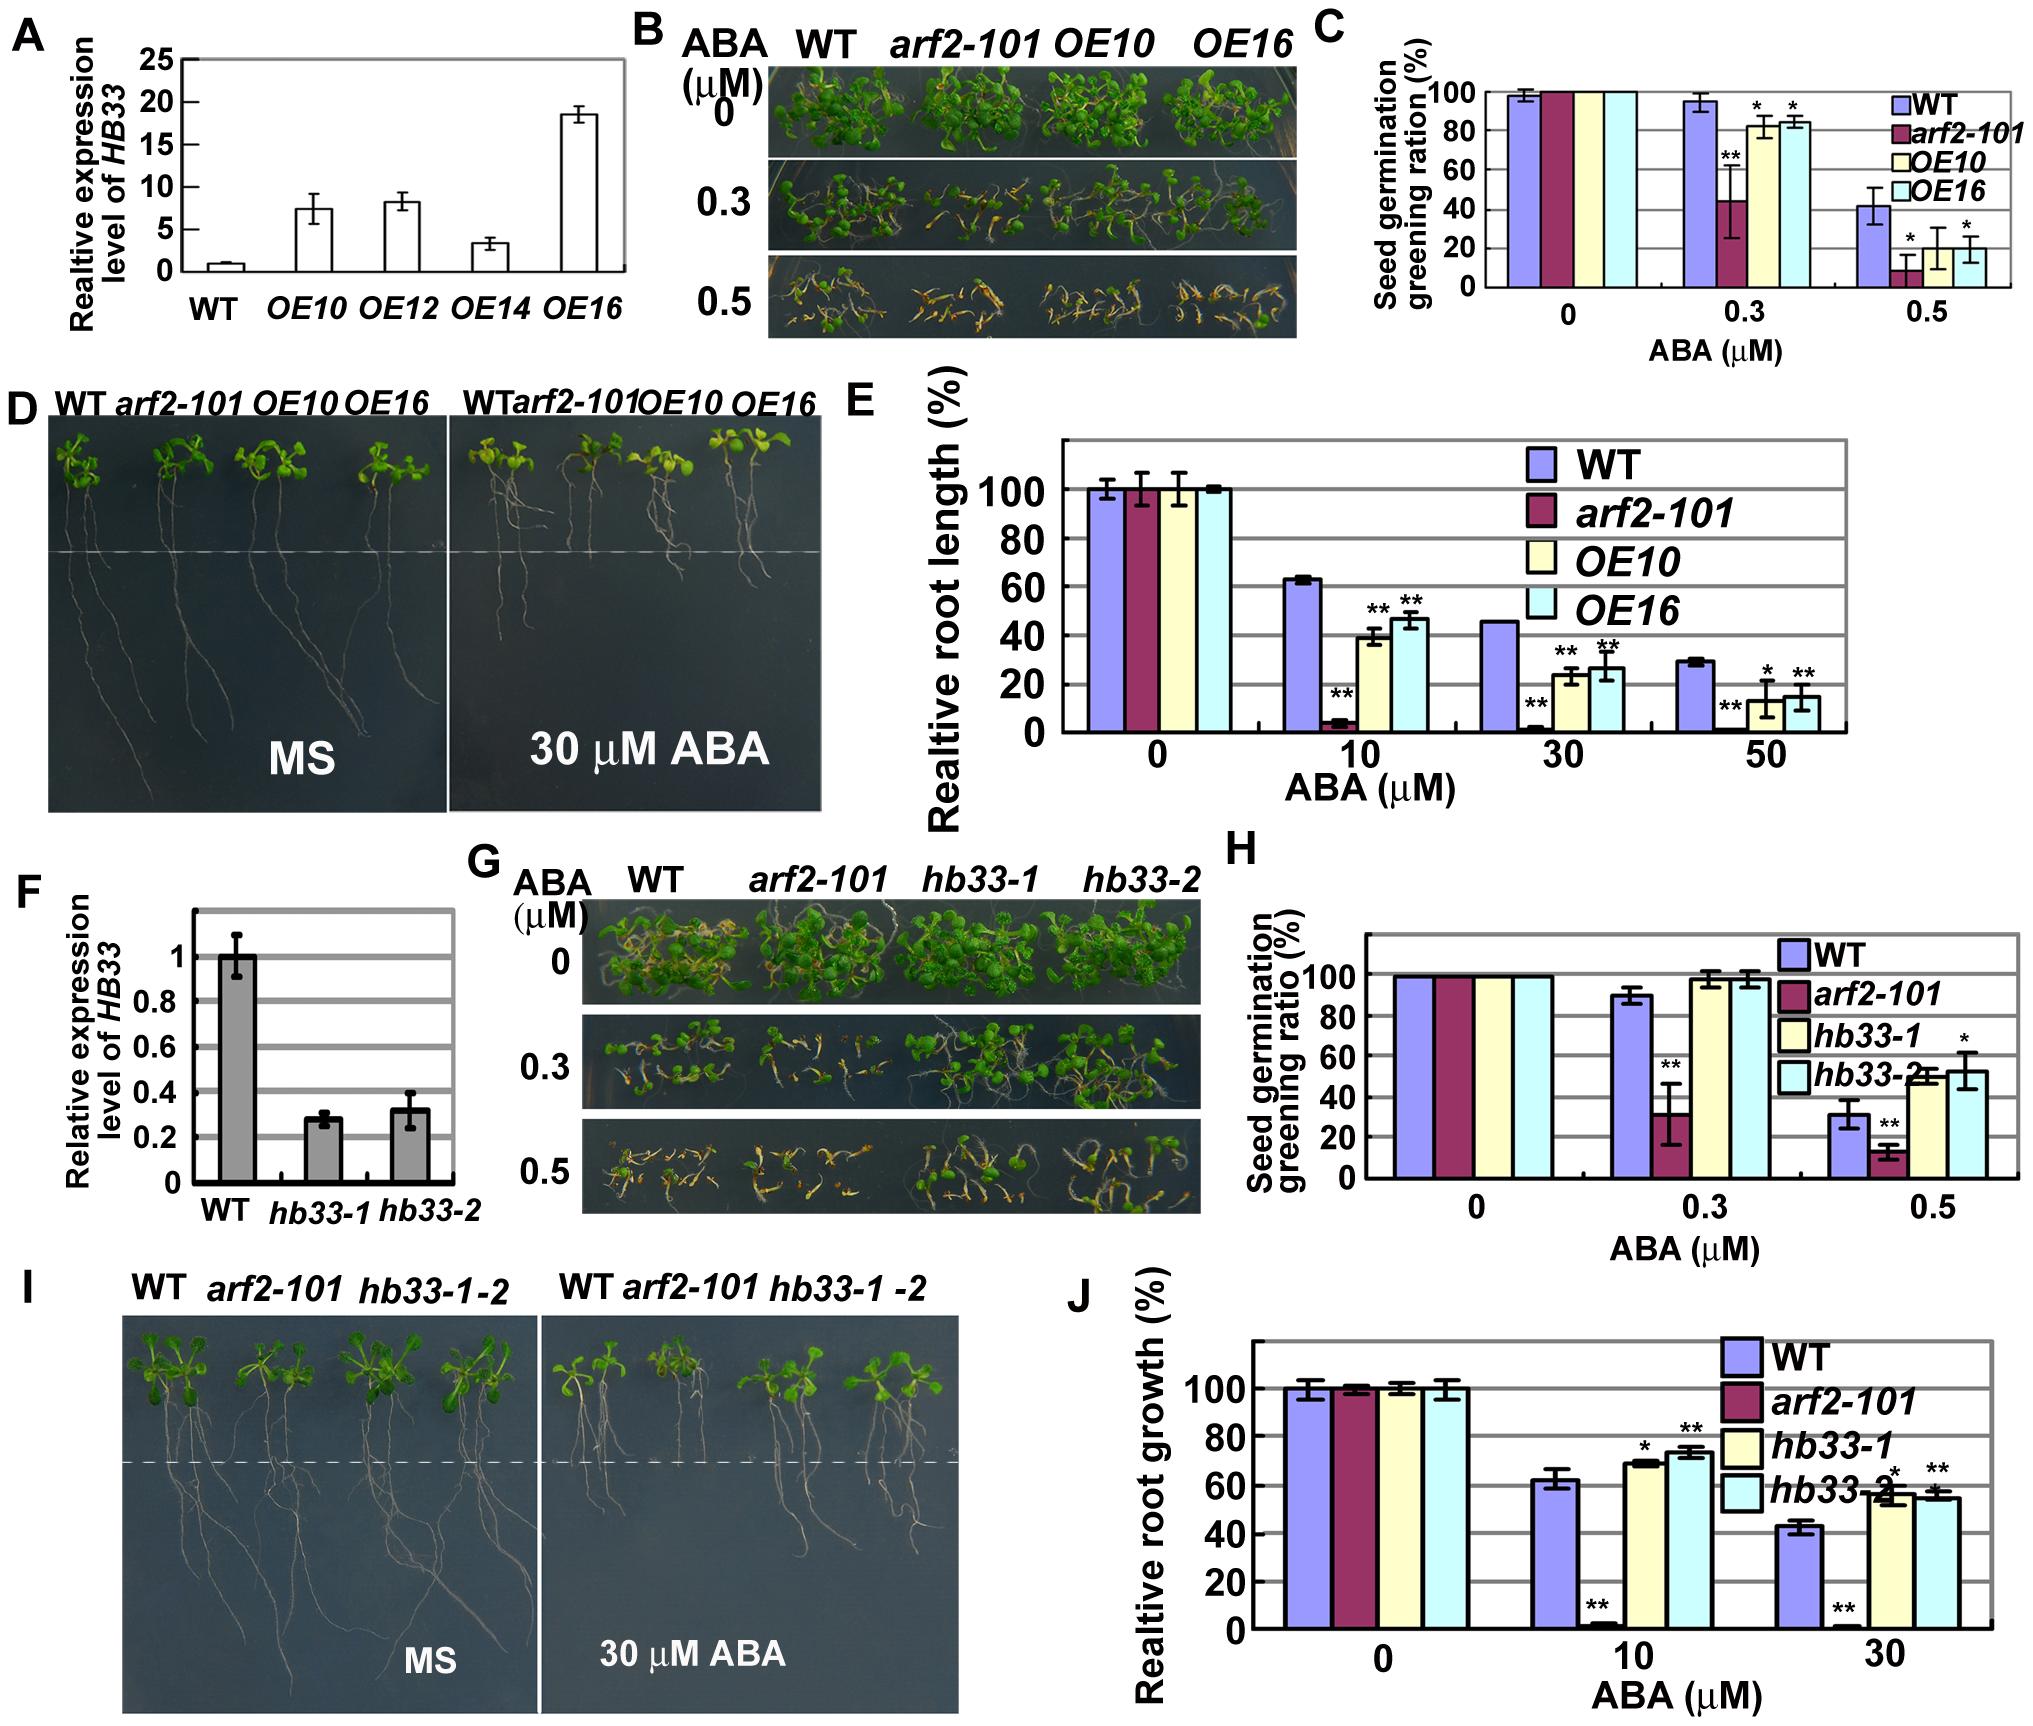 Adverse ABA phenotypes of transgenic plants overexpressing <i>HB33</i> and reducing <i>HB33</i> by RNAi.